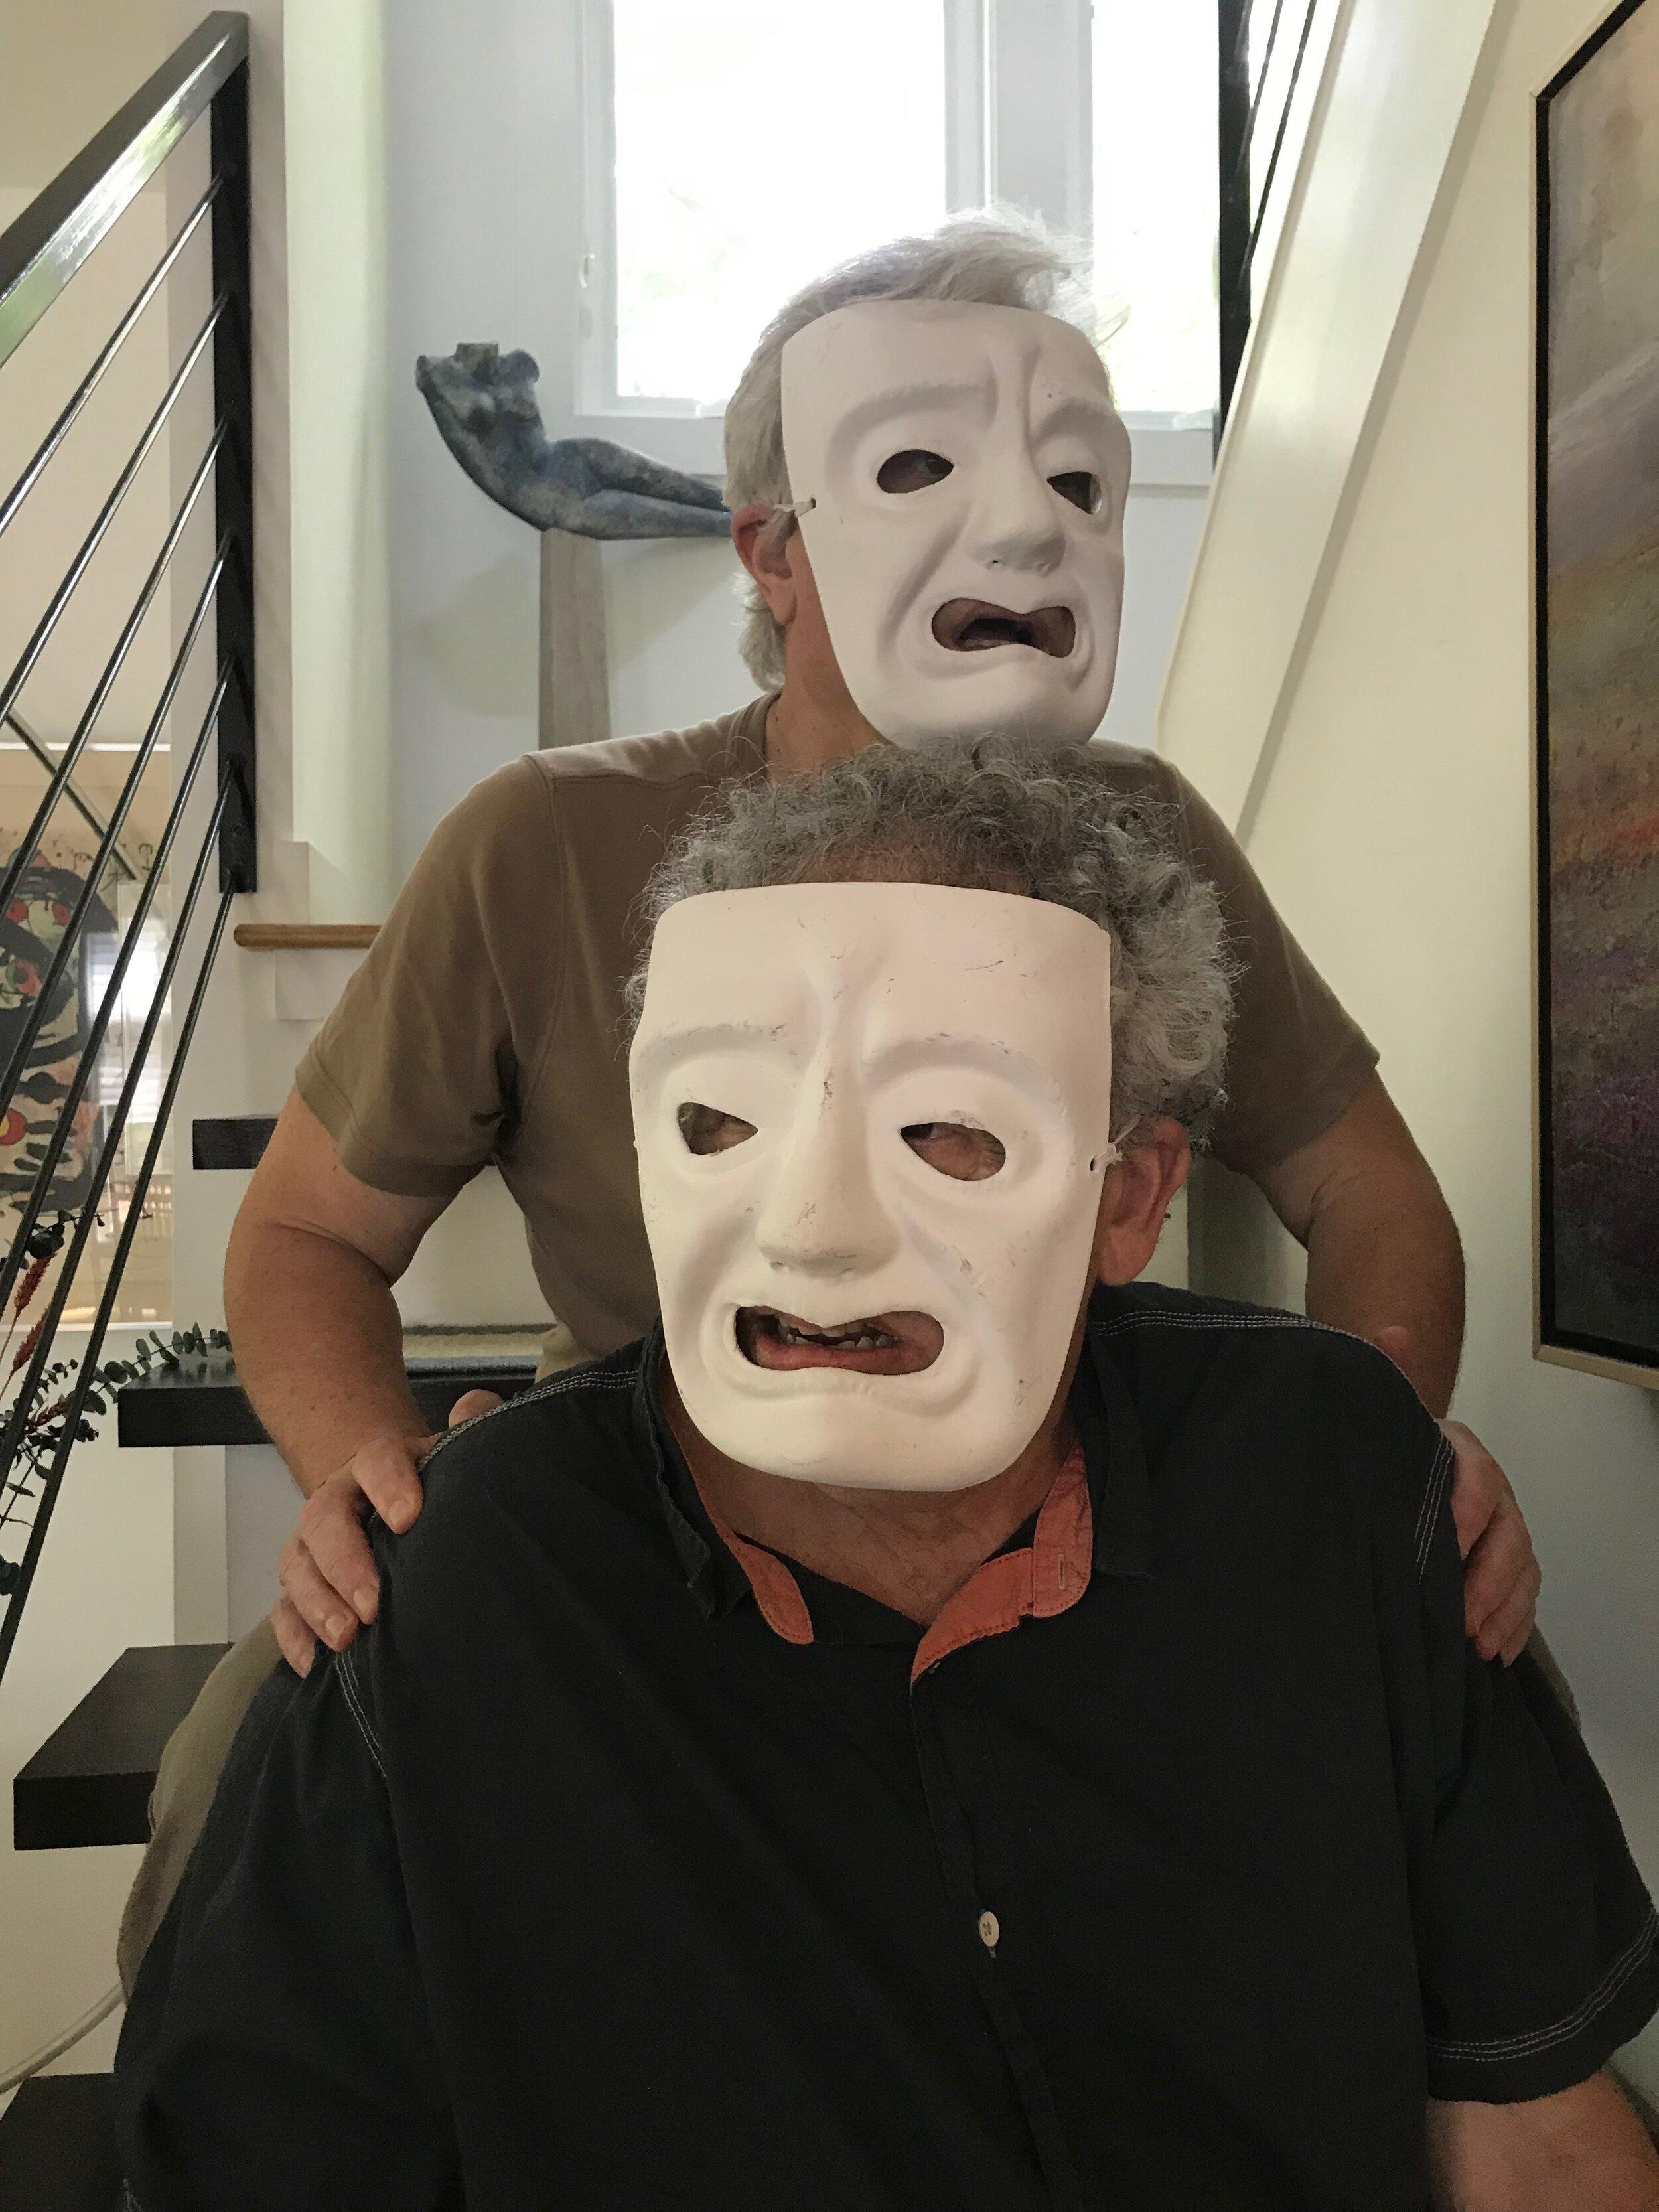 Paul and Ian's One-Man Show (US)